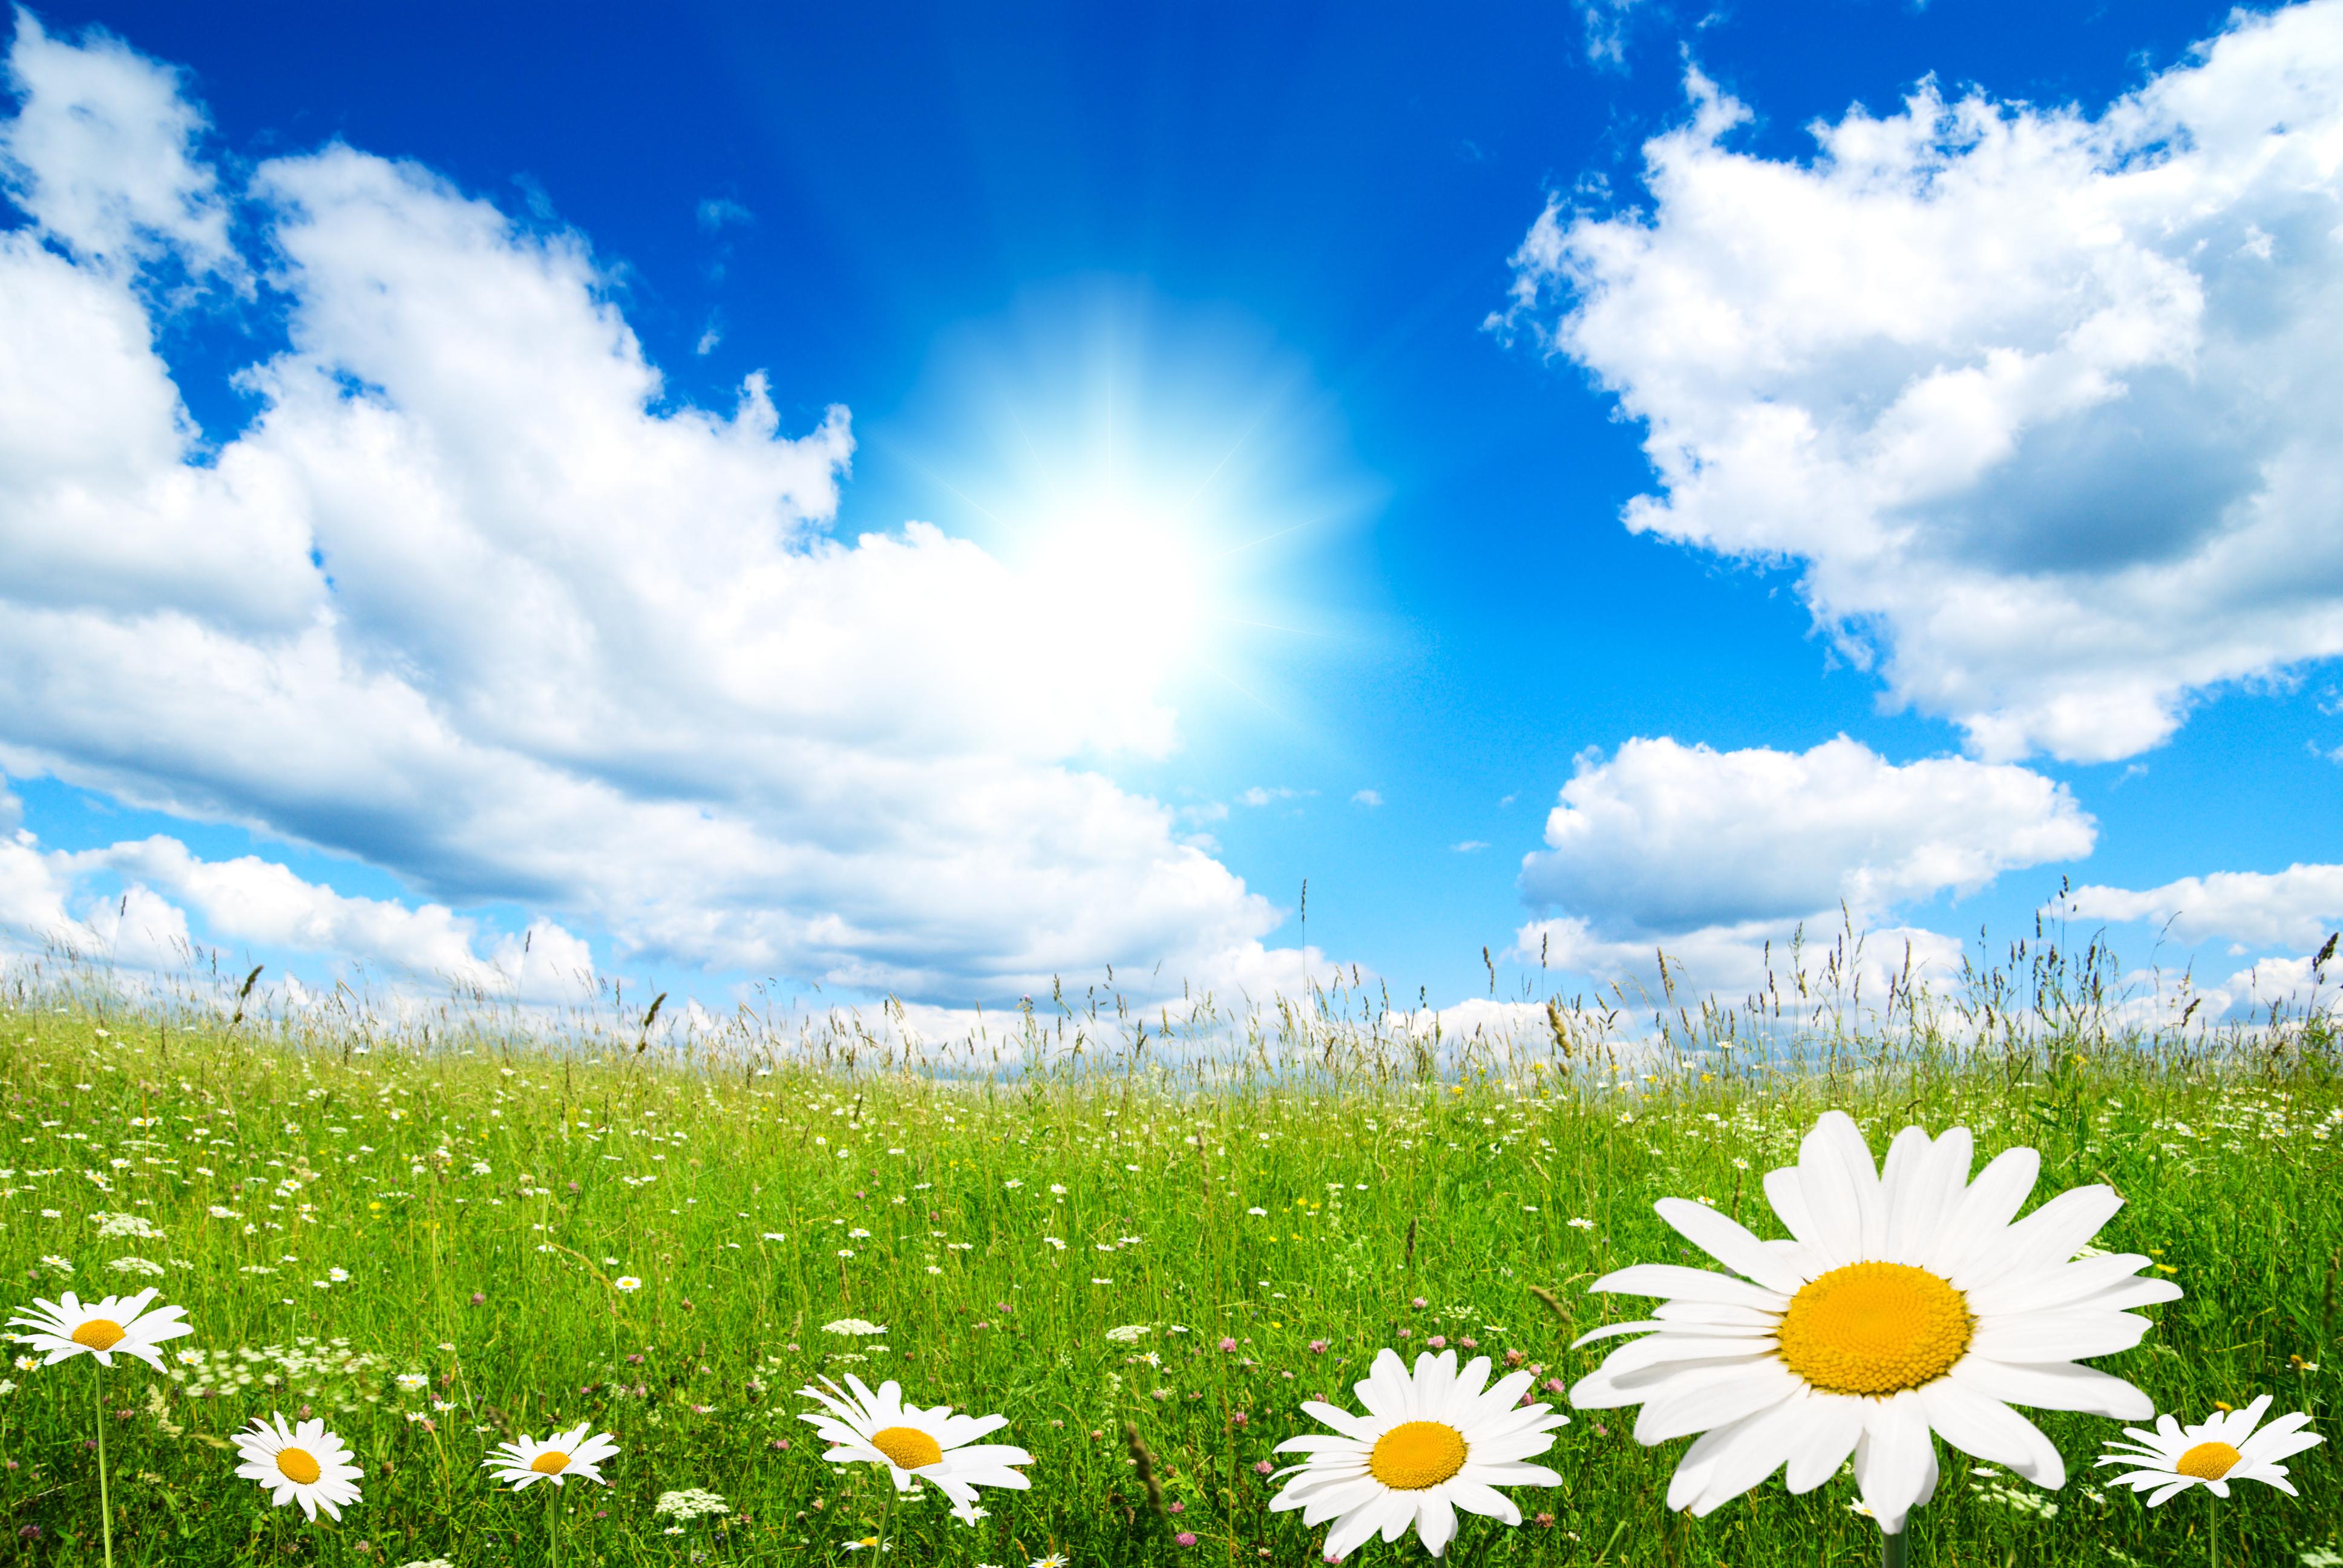 Spring Screensavers And Wallpapers Springtime HD Screensavers 3872x2592